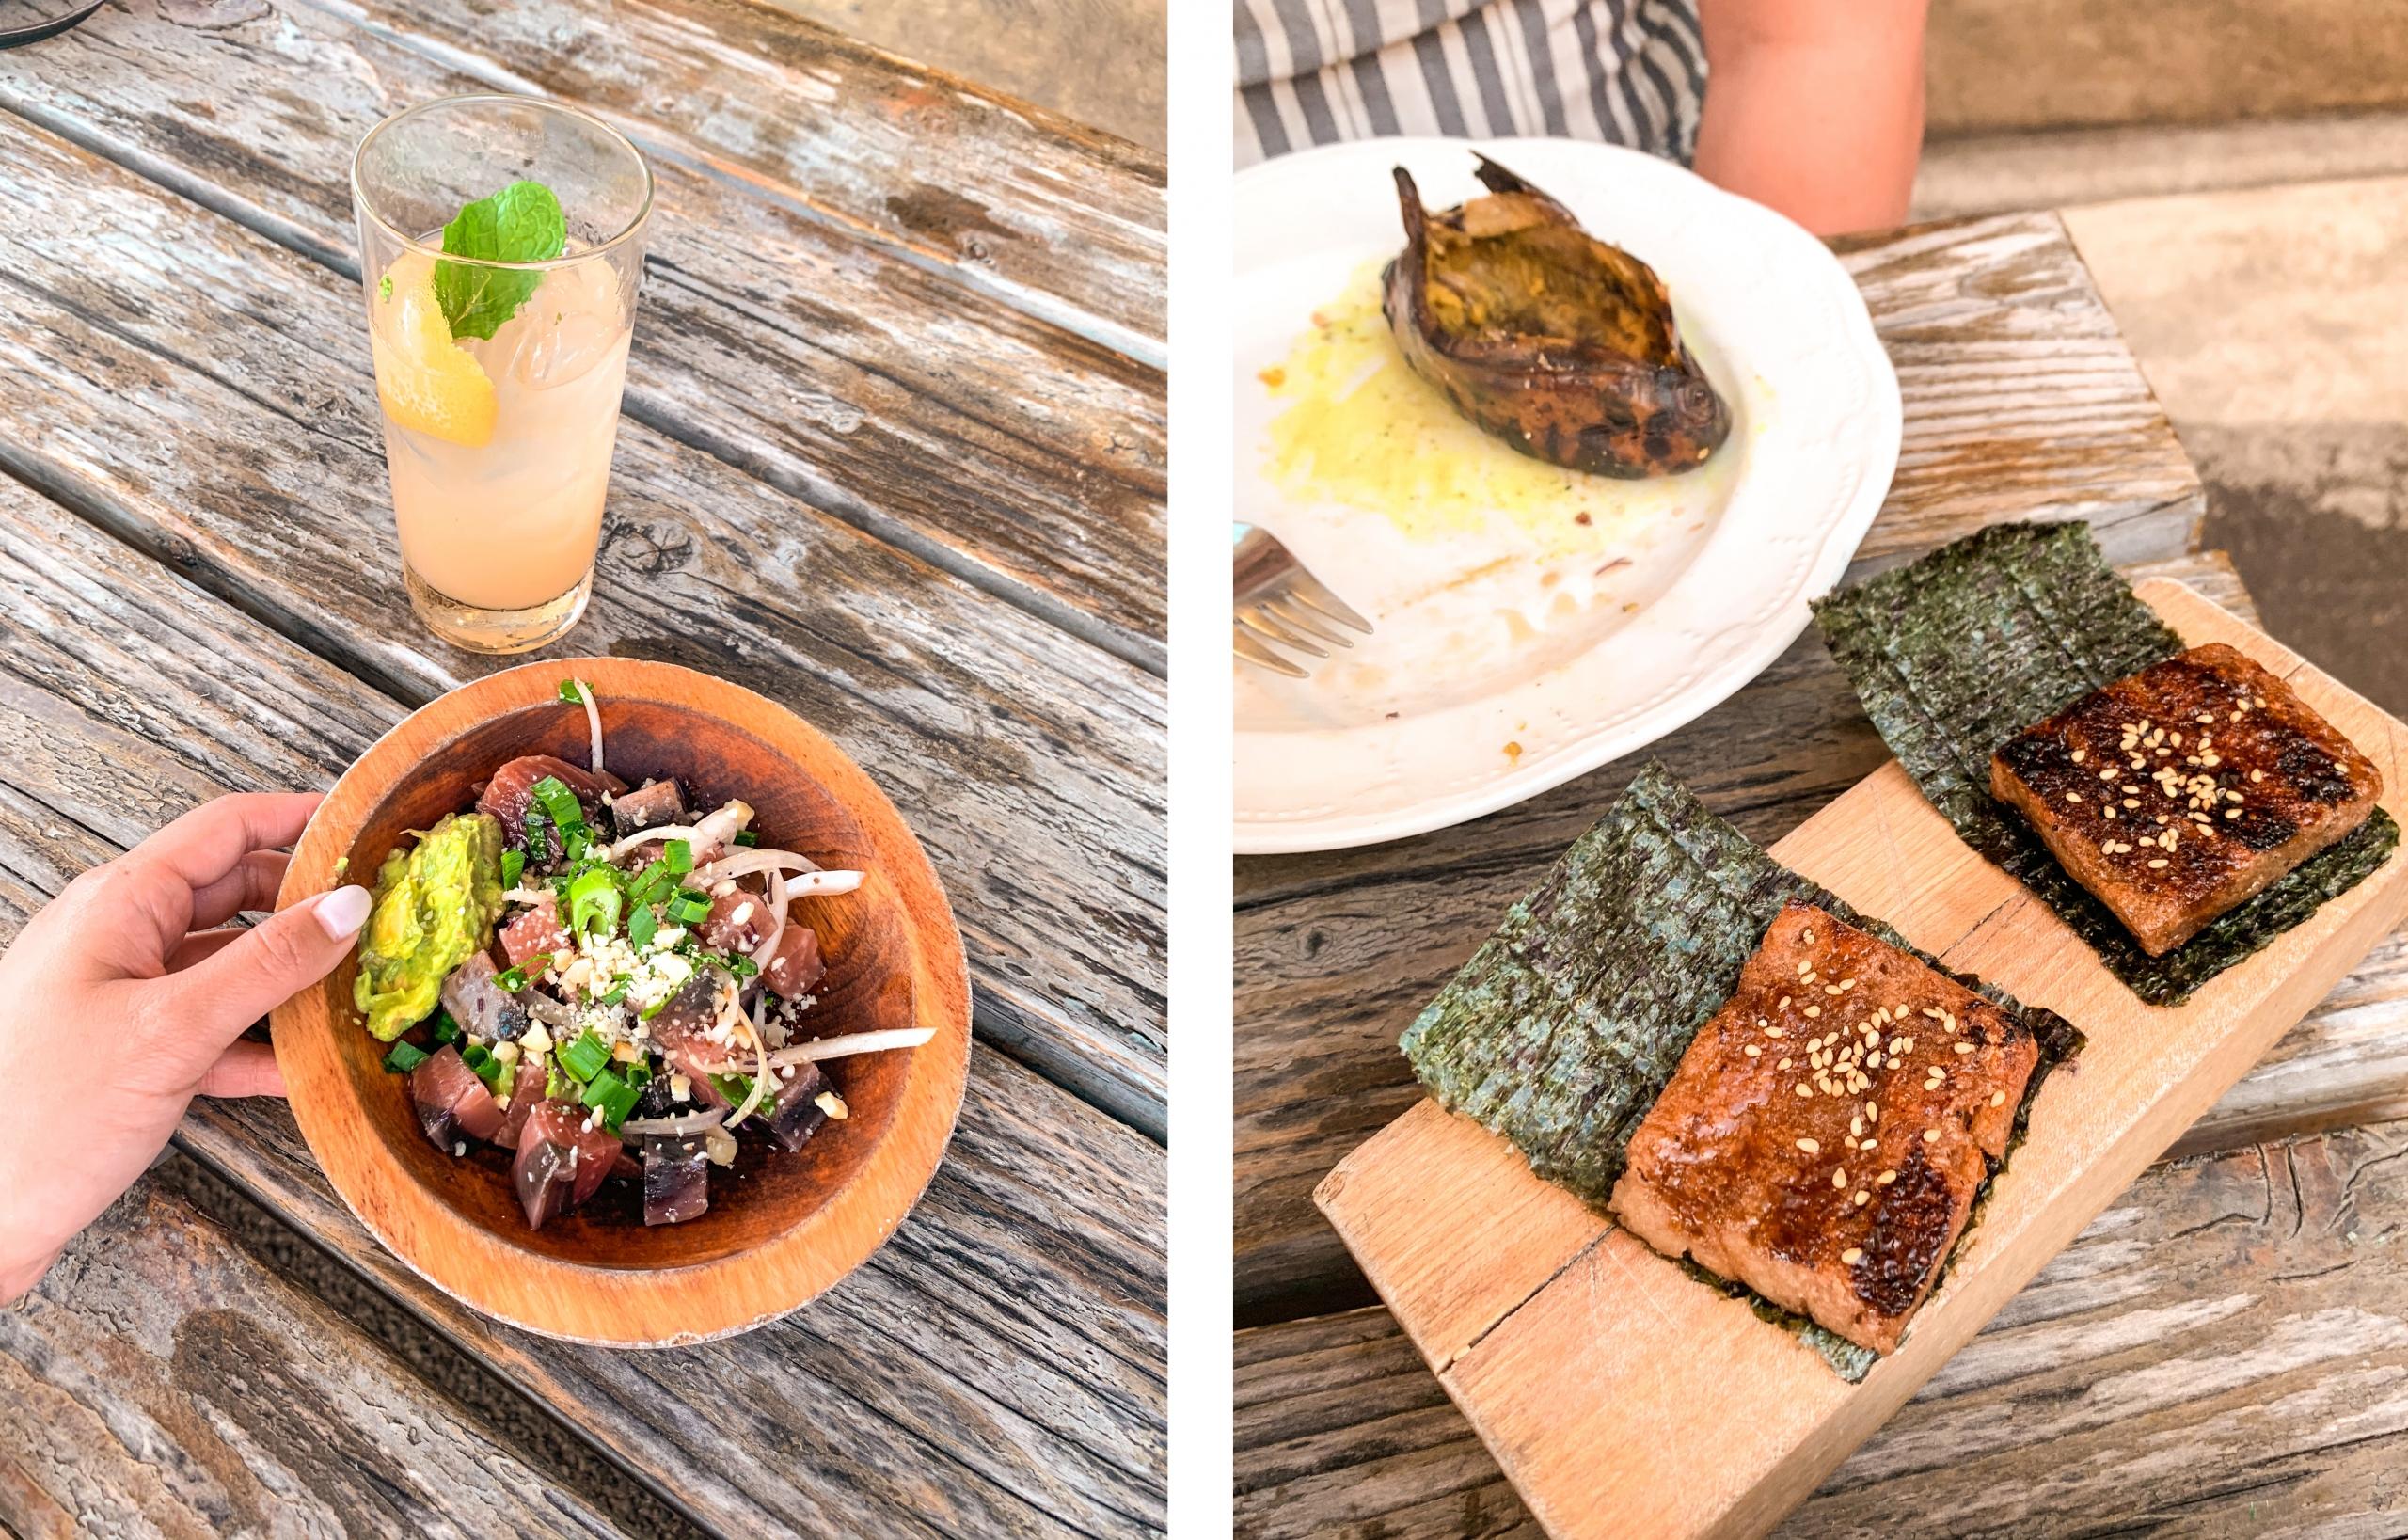 Places to eat in Oahu, Hawaii - Mud Hen Water food